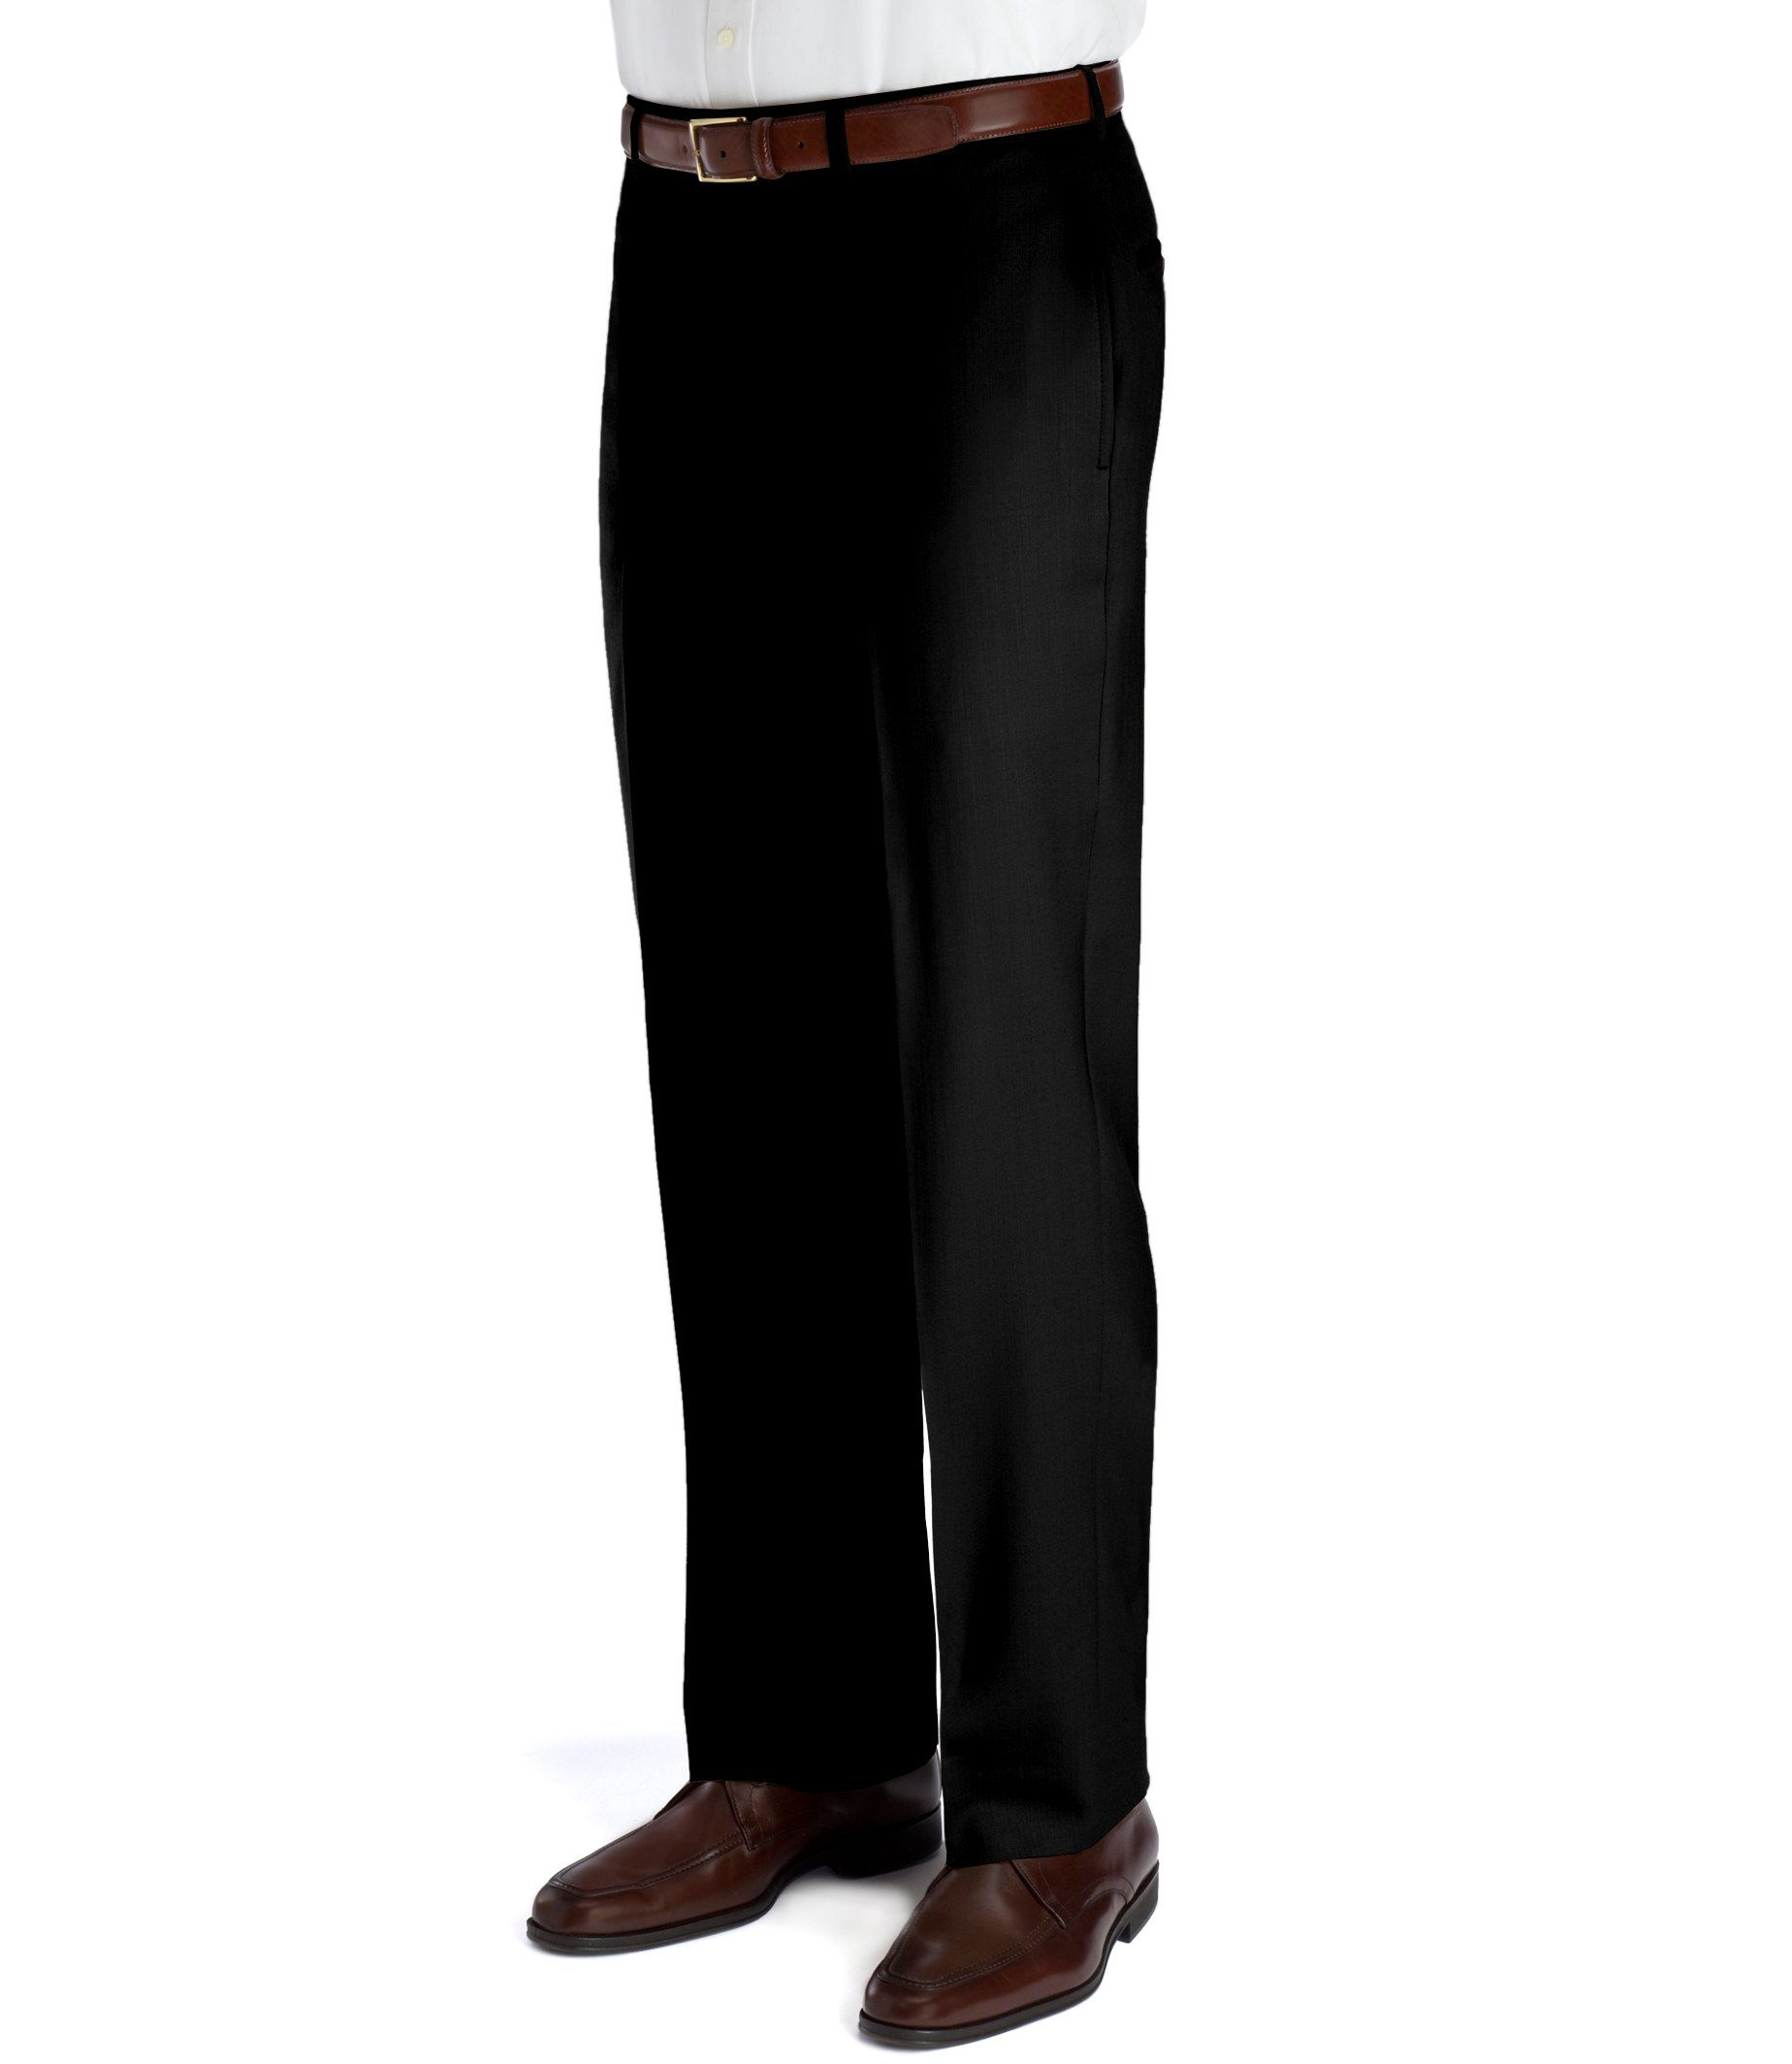 Shop Men's Clearance Dress Pants & Slacks | Jos A. Bank